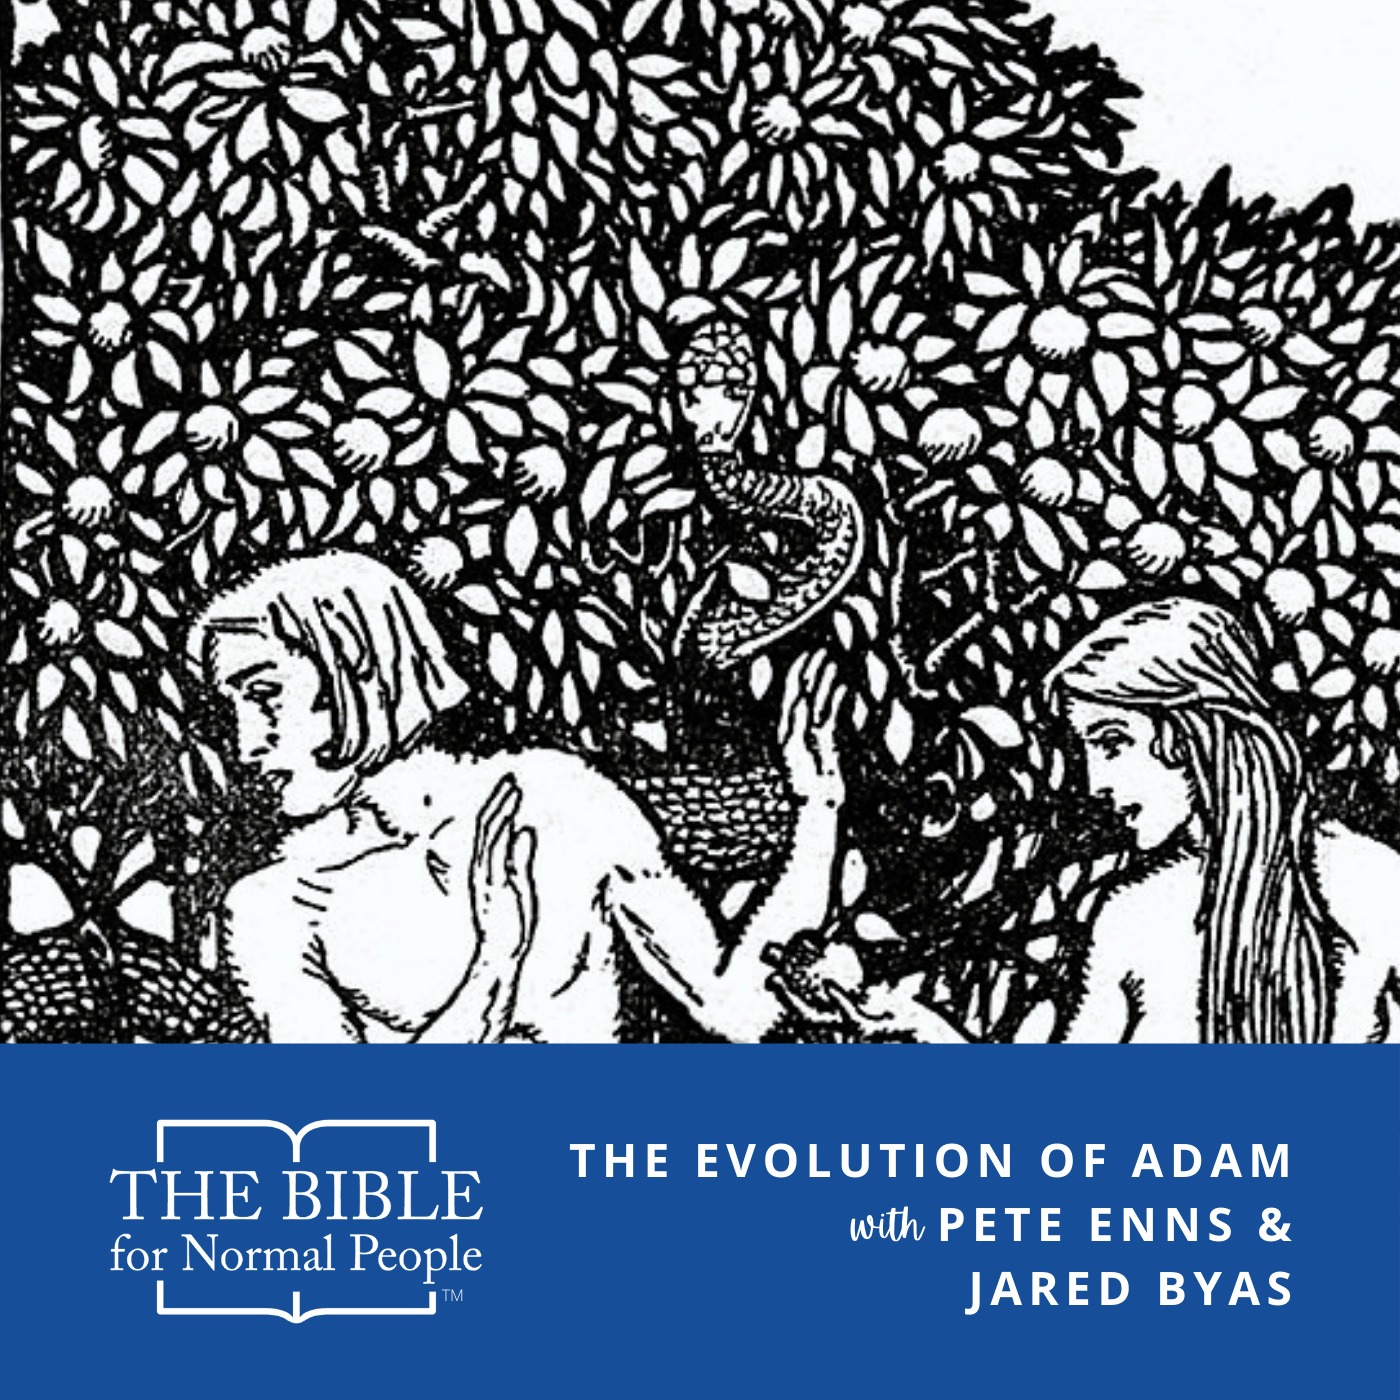 Episode 182: Pete & Jared - The Evolution of Adam